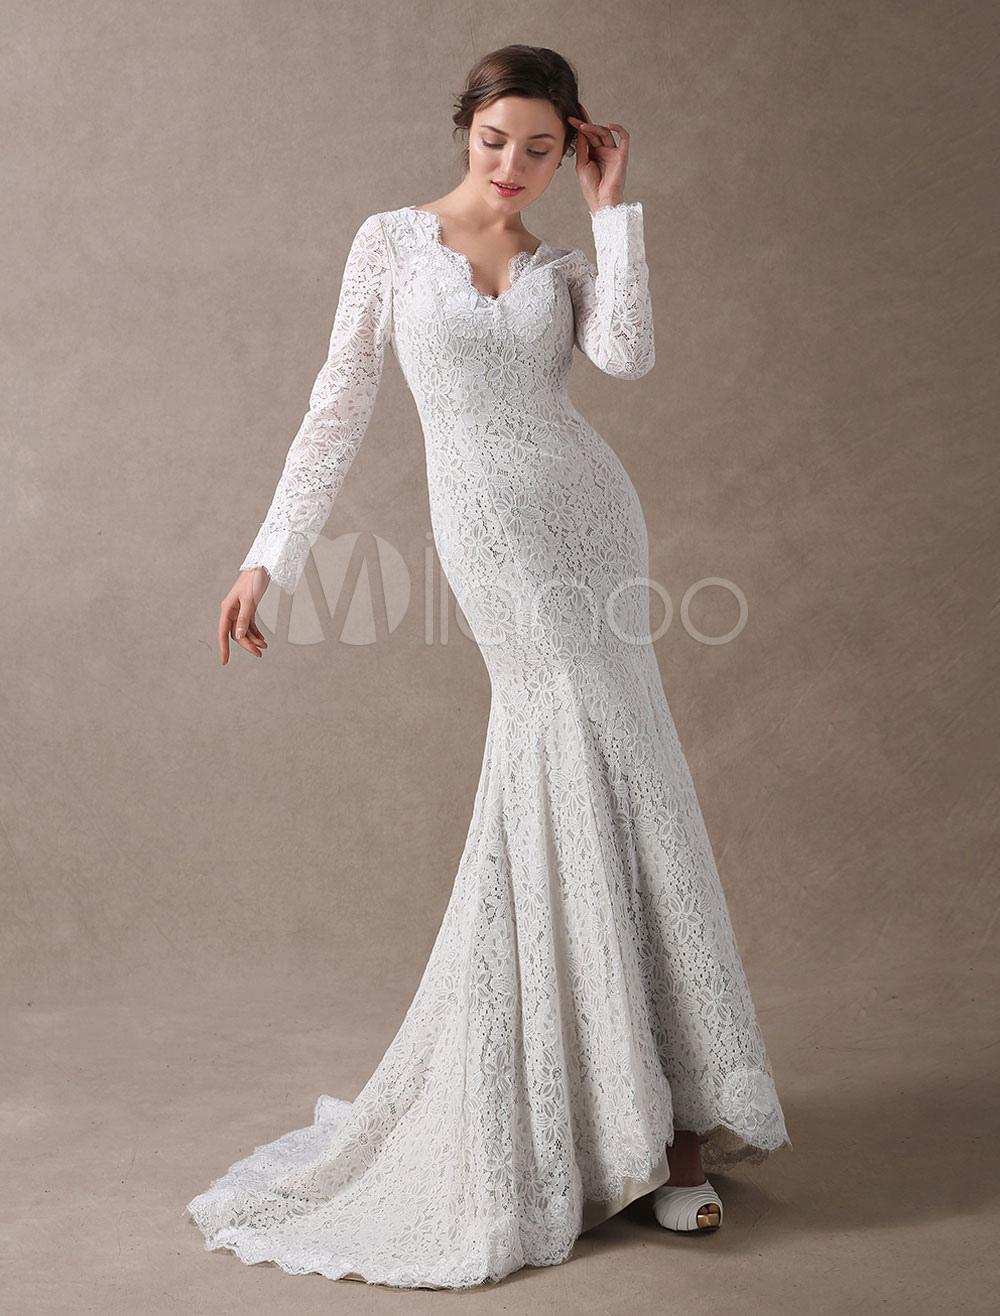 Lace Wedding Dresses Mermaid Long Sleeve Bridal Dress Ivory V Neck Backless Wedding Gowns With Train photo